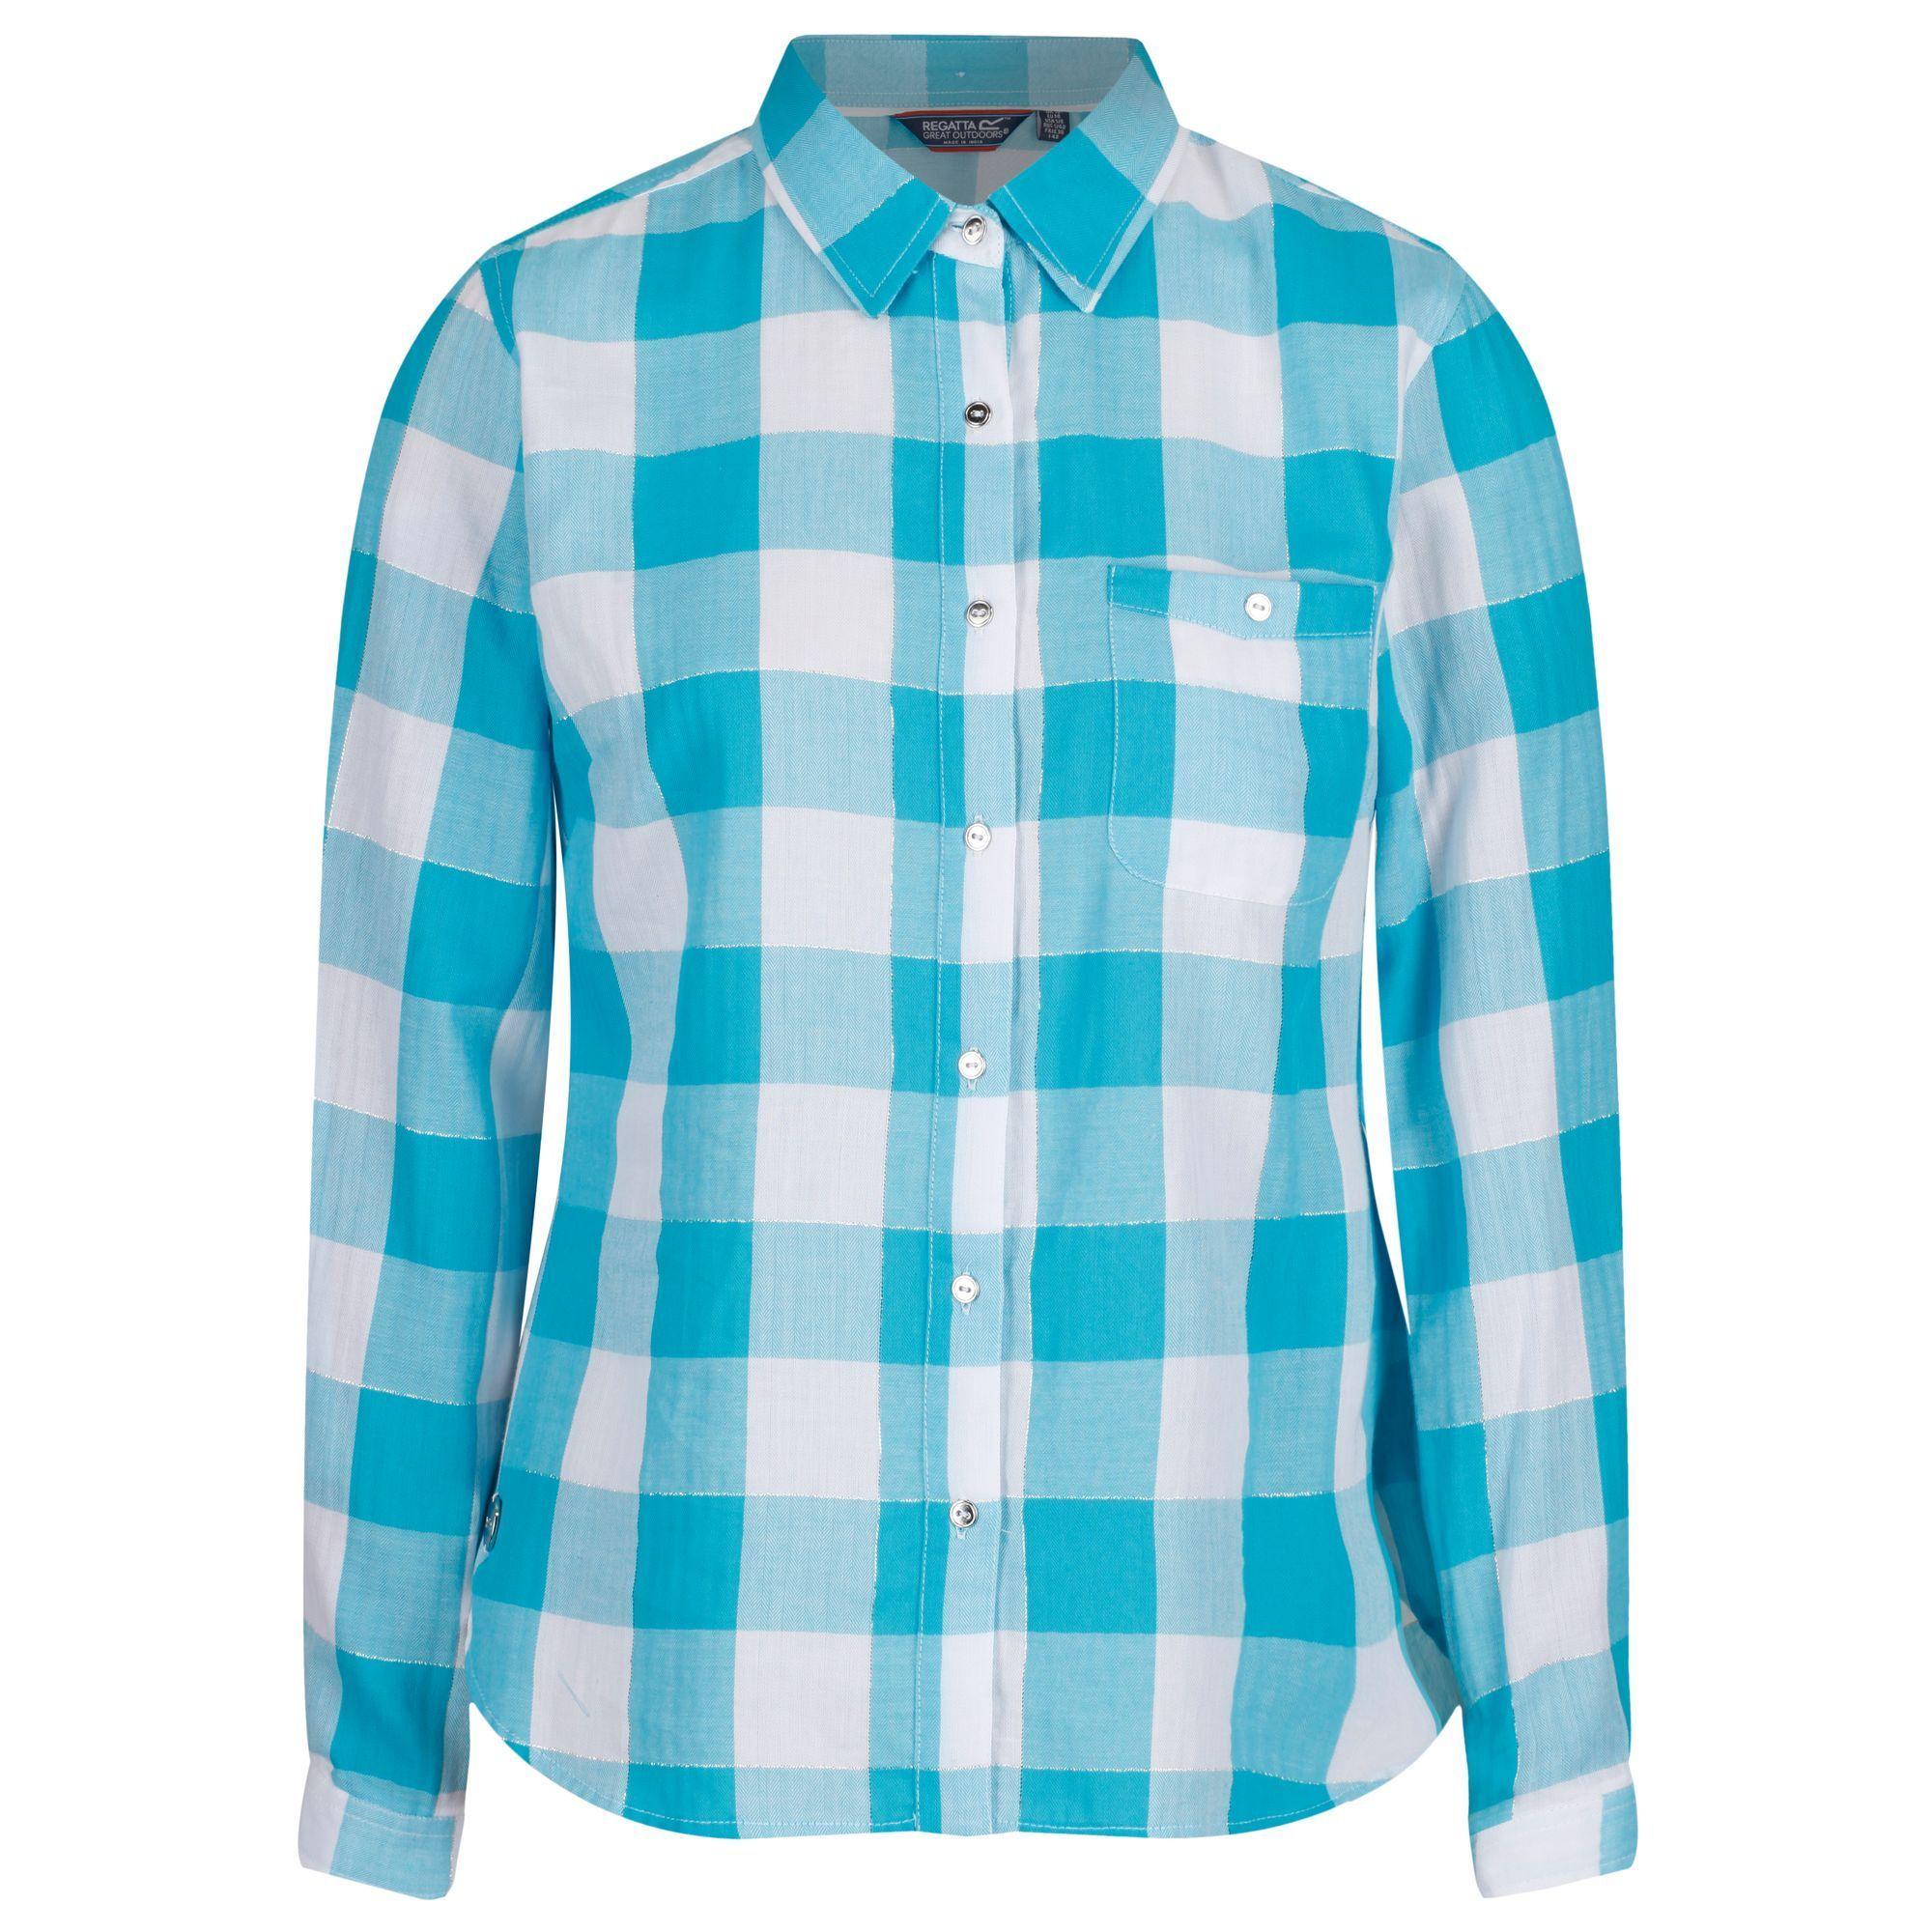 Regatta Womens Merrial Coolweave Cotton Long Sleeve Shirt